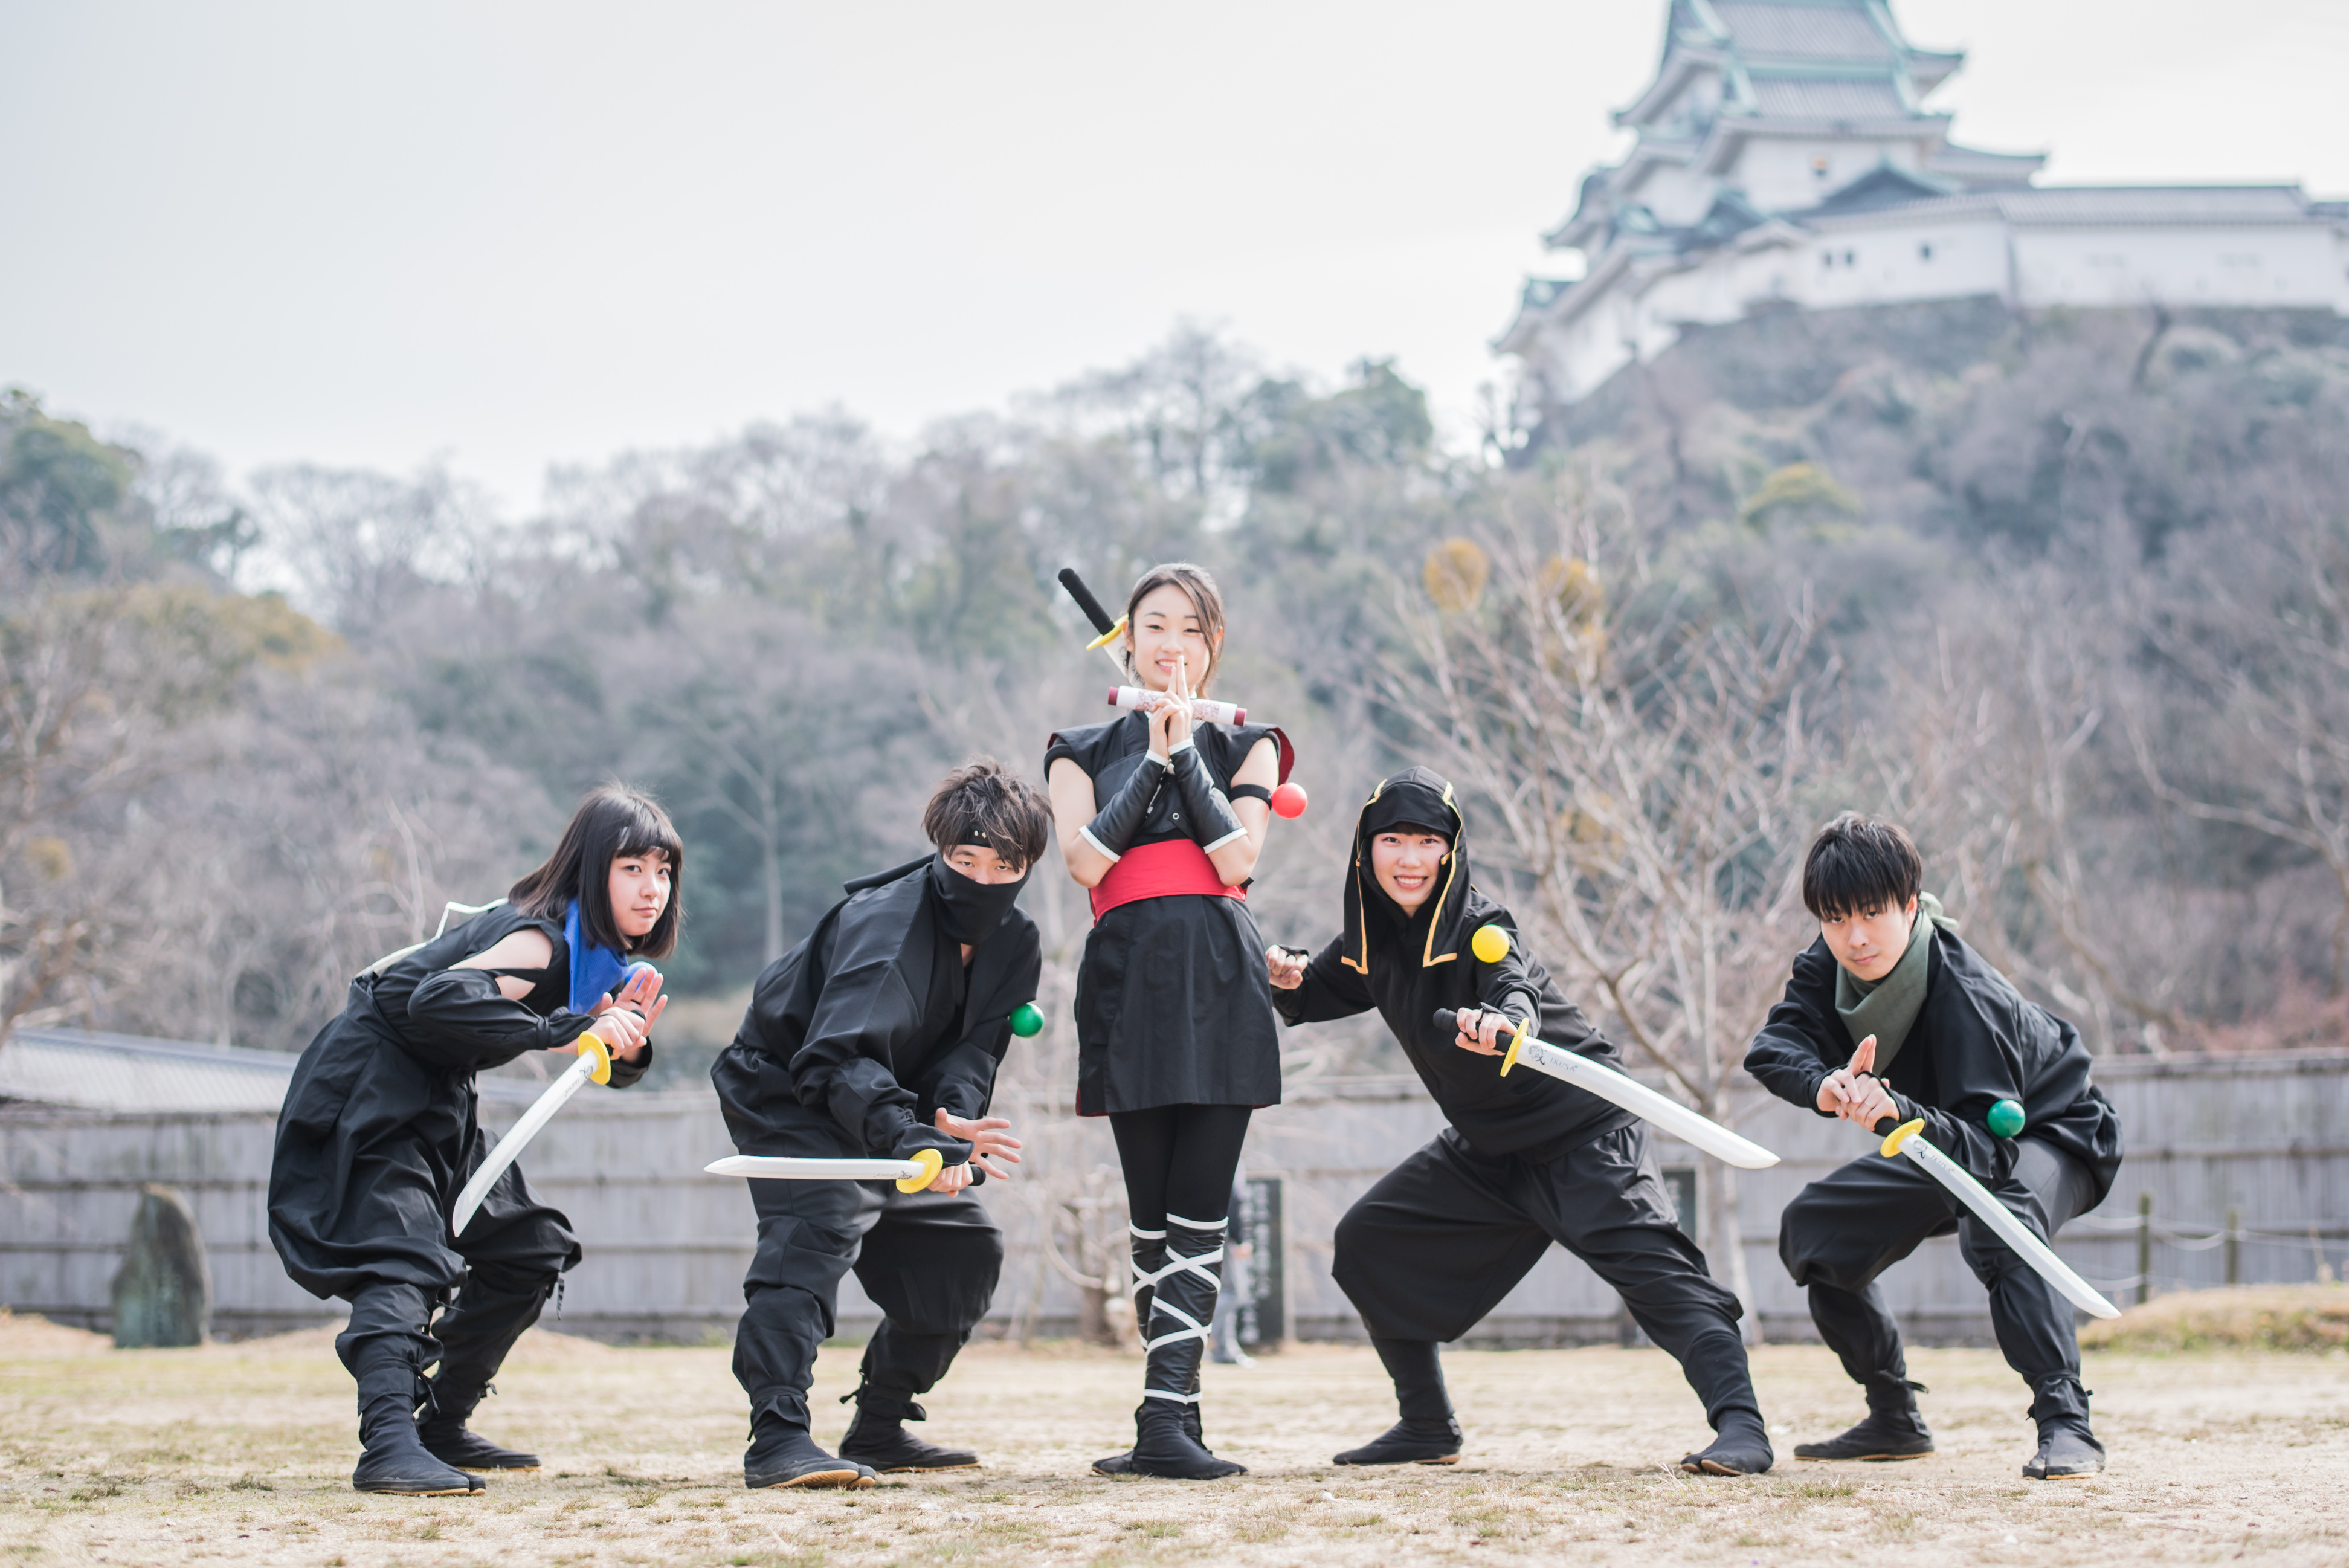 忍者合戦-SHINOBI-